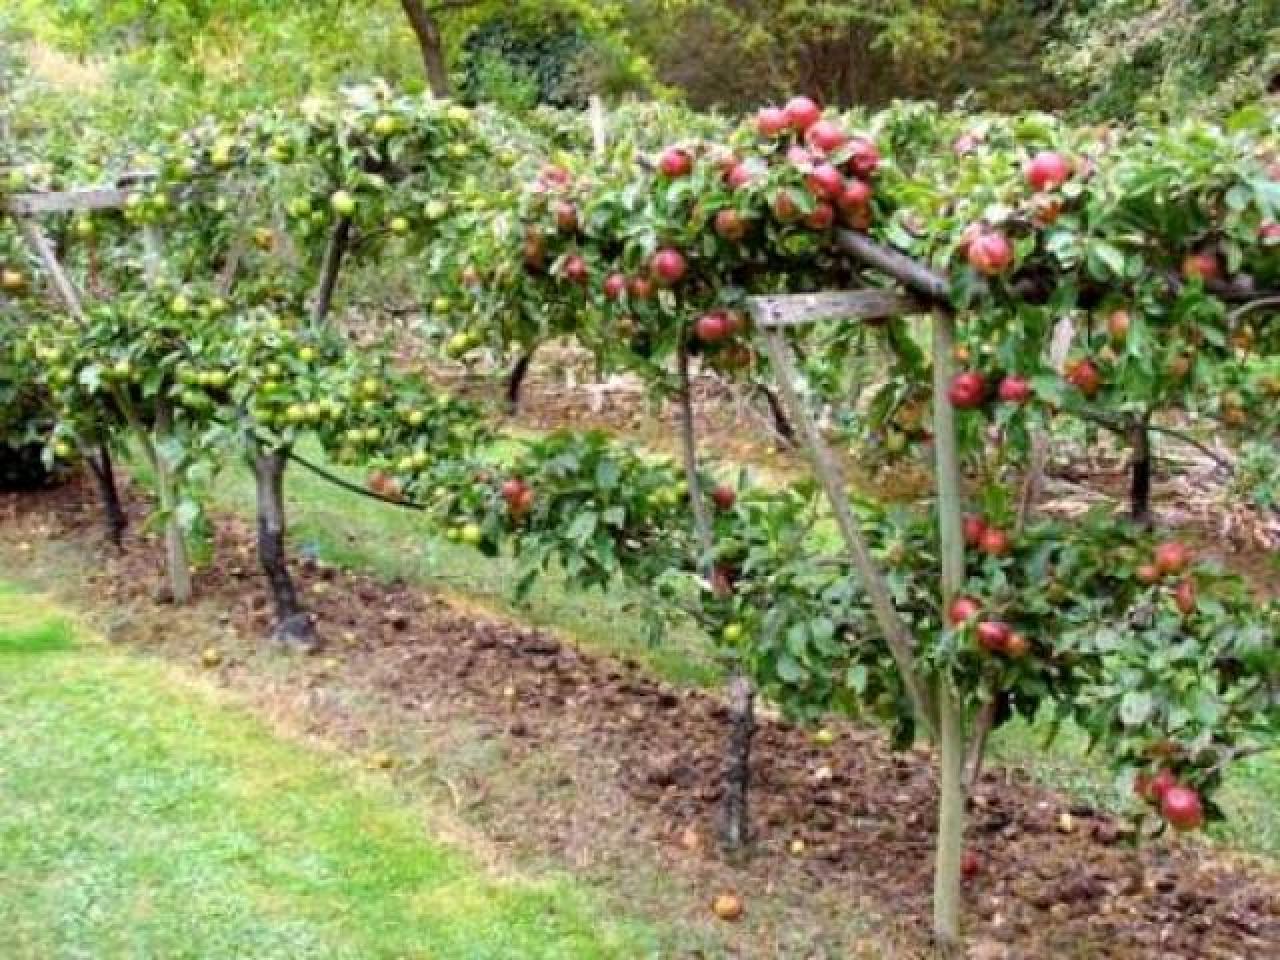 Ищут работу Специалист ищет работу садовника. Садовый дизайн. London Доска Объявлений Англии